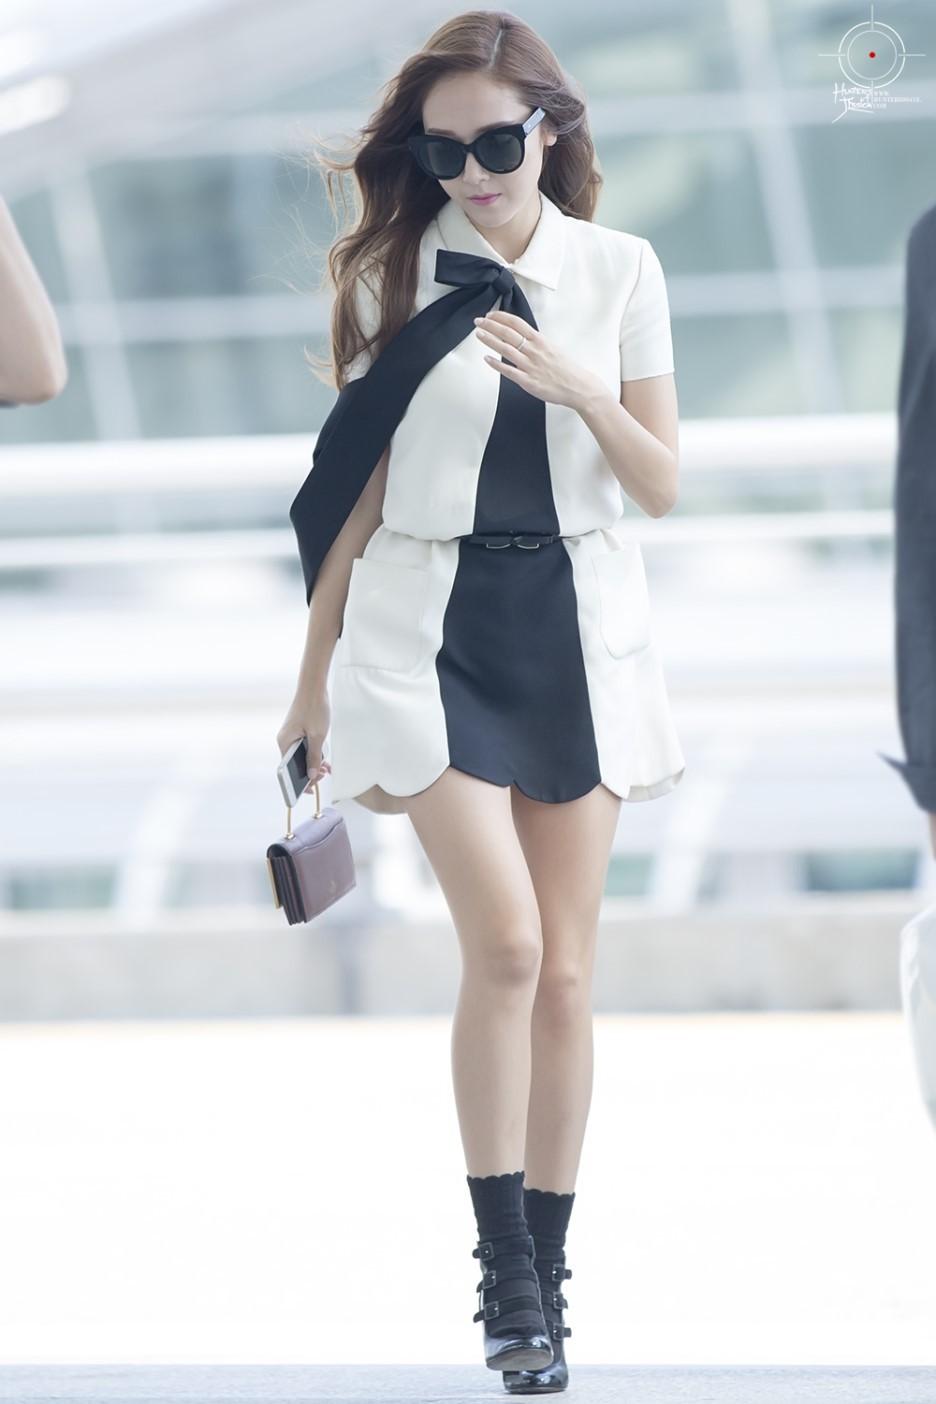 Jessica Airport Fashion 2015 Official Korean Fashion